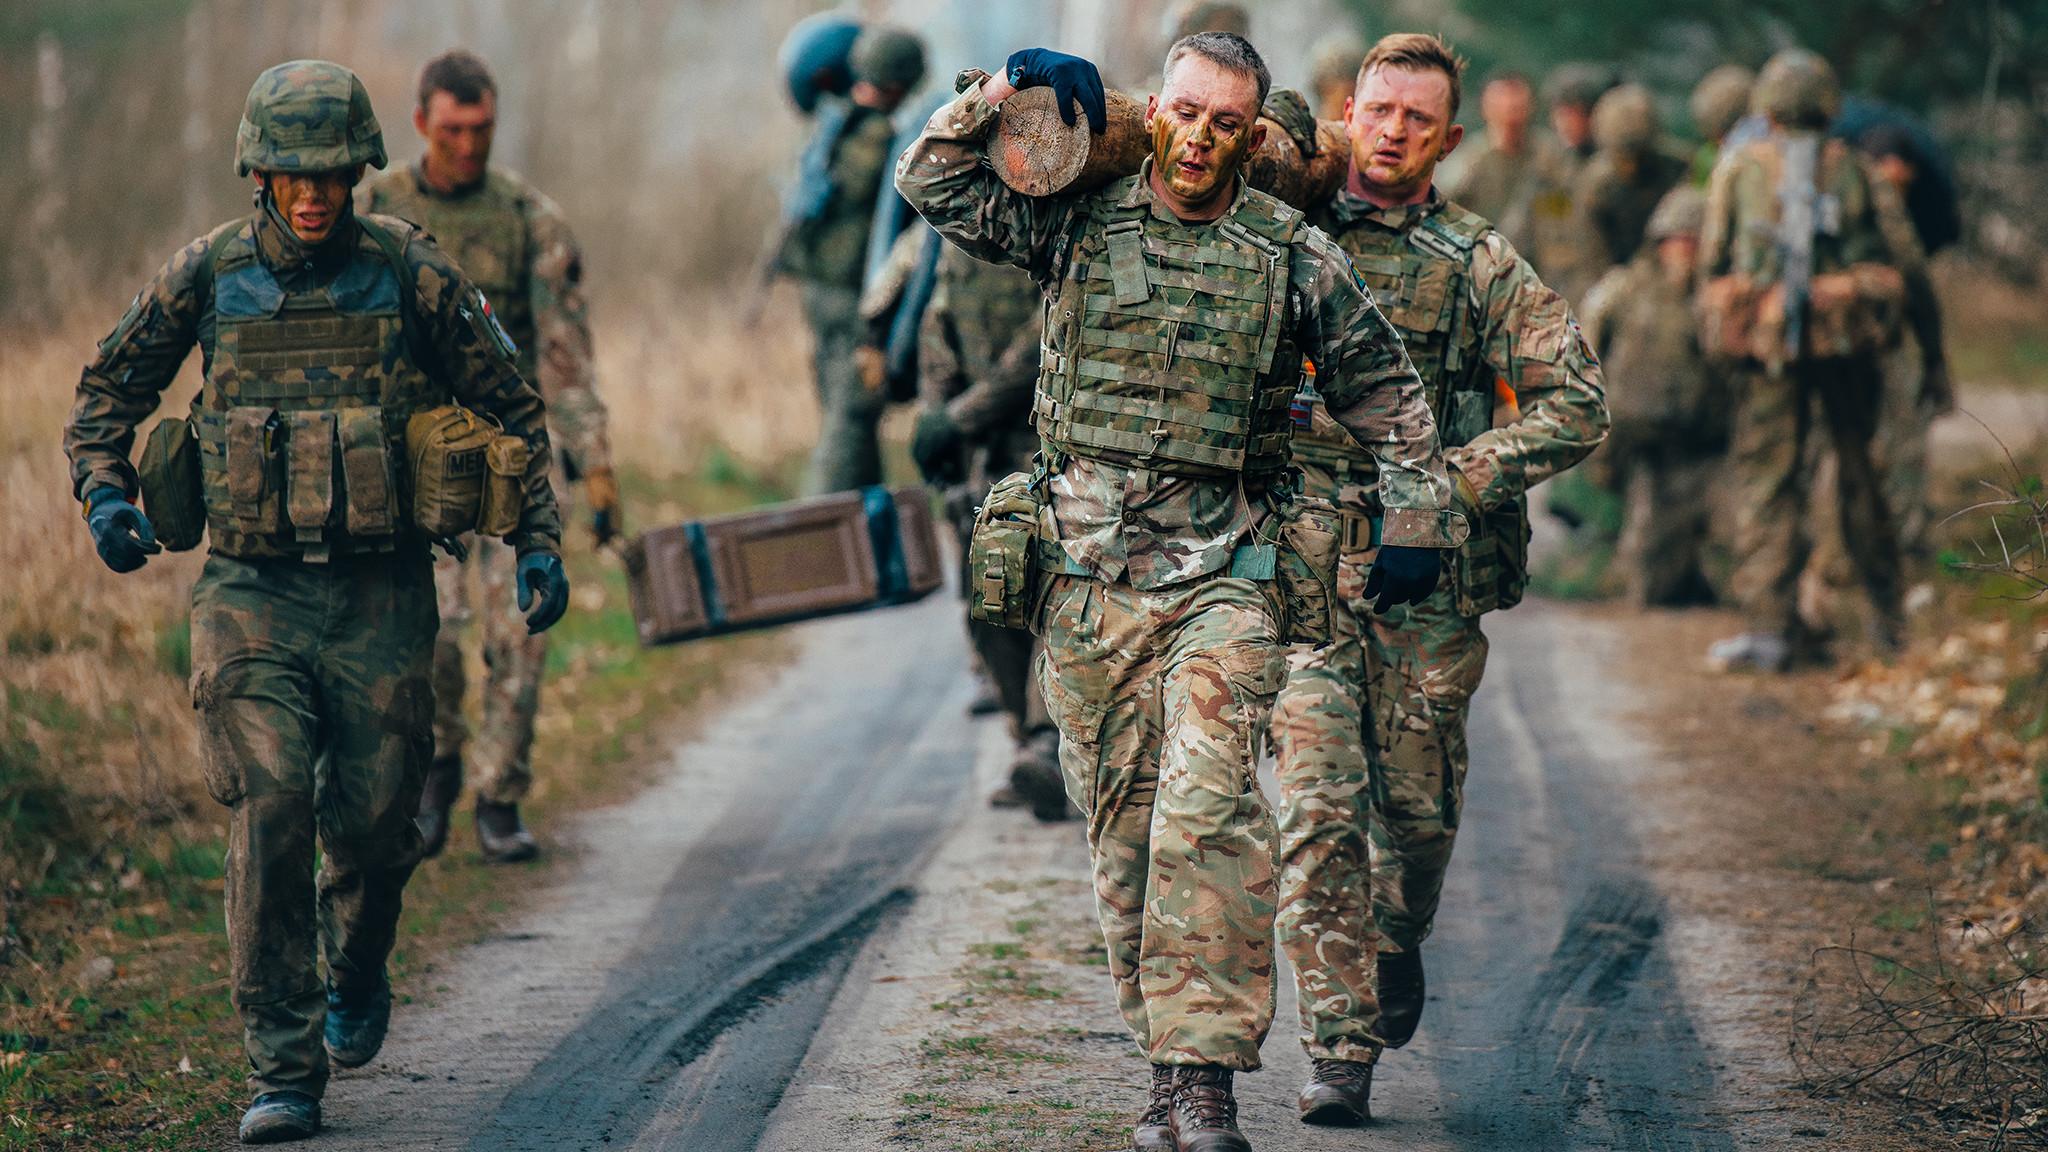 British Army's • Combat Fitness • Poland 2020